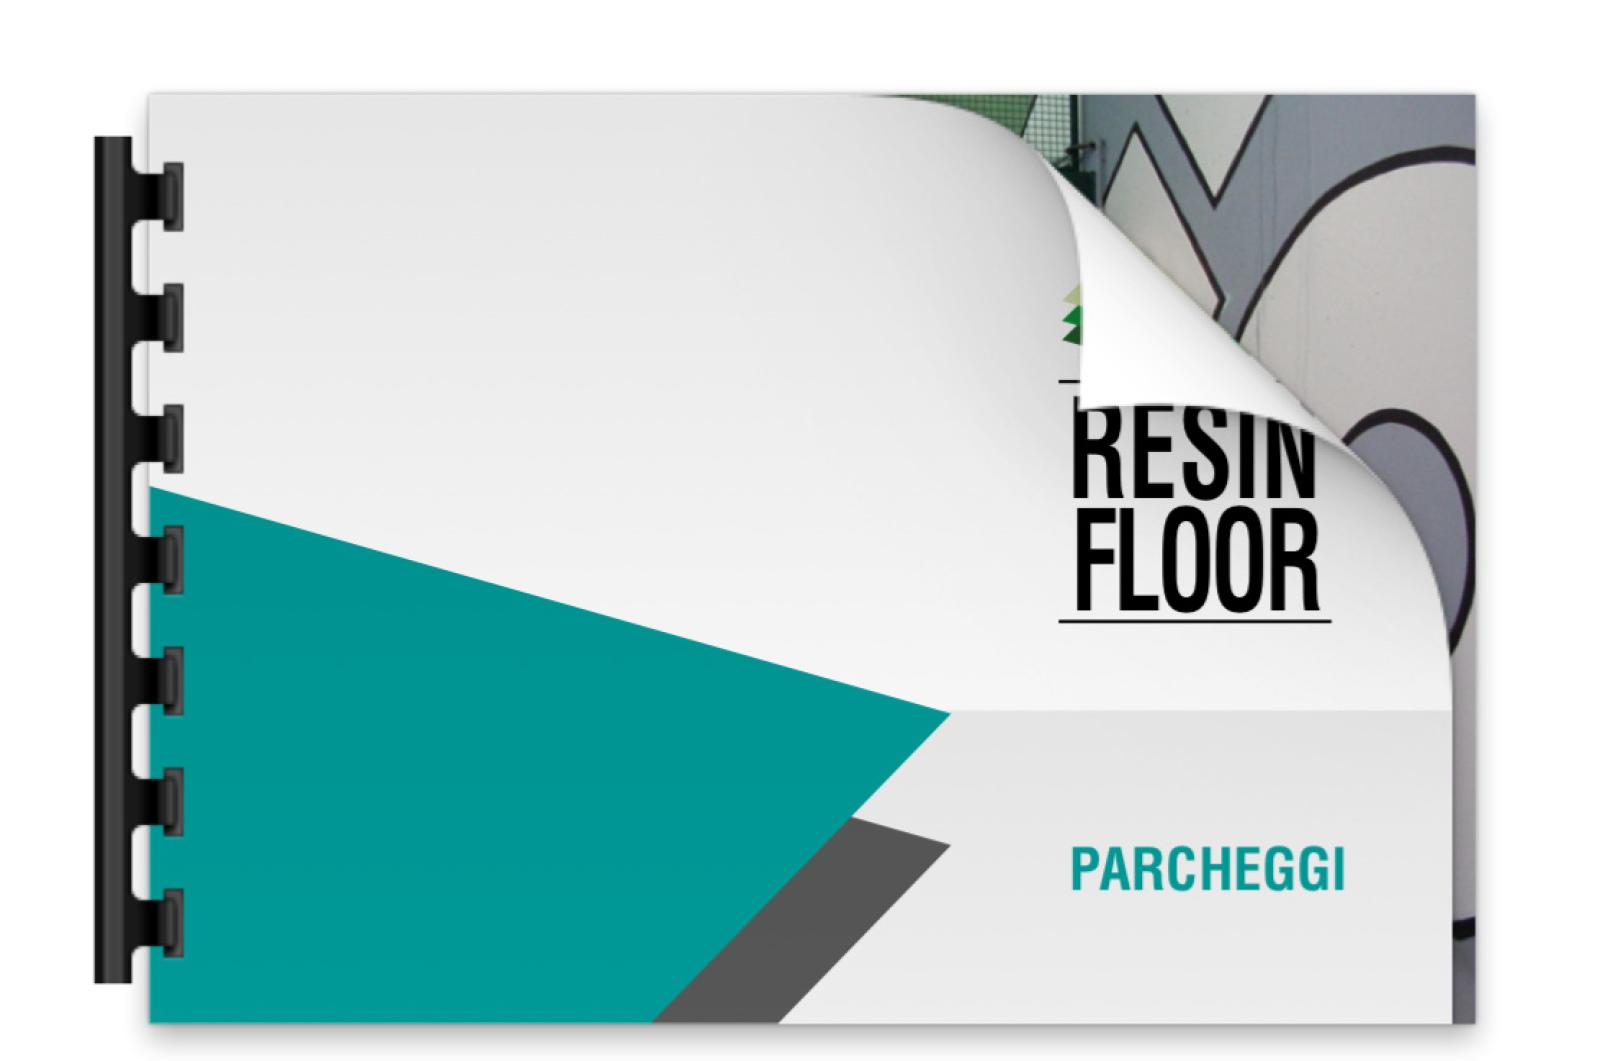 Catalogo parcheggi in resina resin floor srl for Catalogo pdf